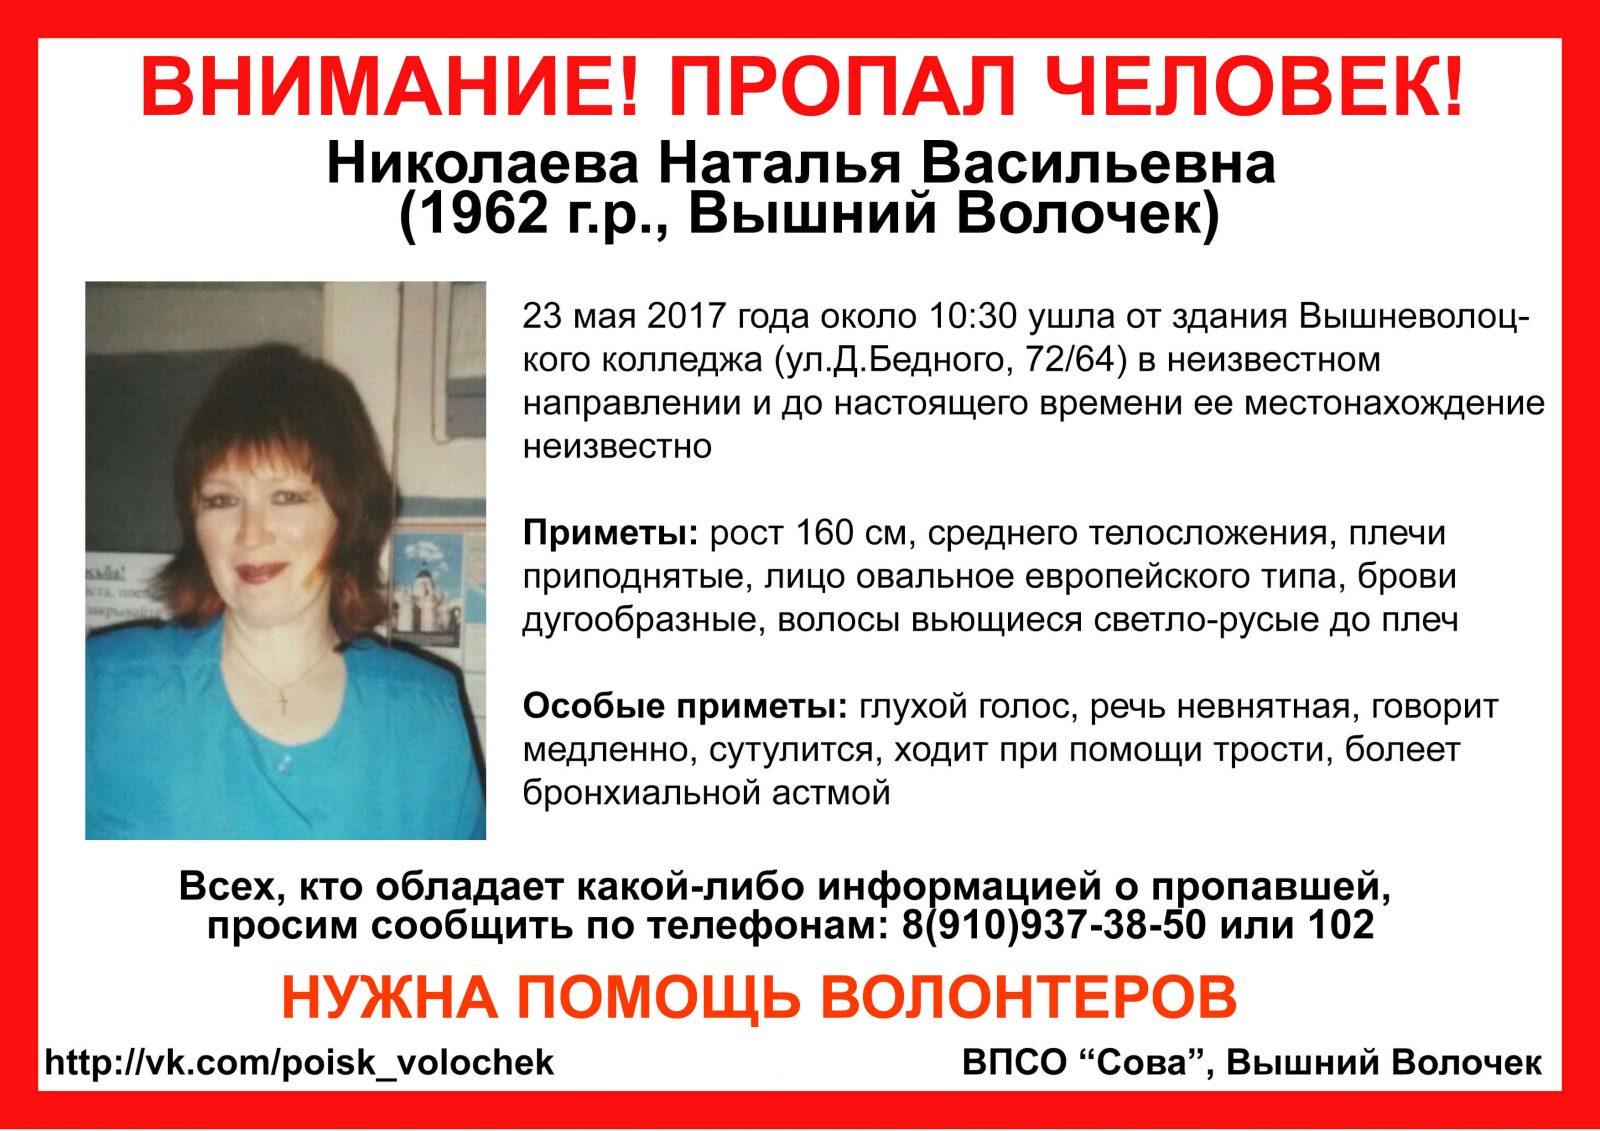 Пропала Николаева Наталья Васильевна (1962 г.р.)